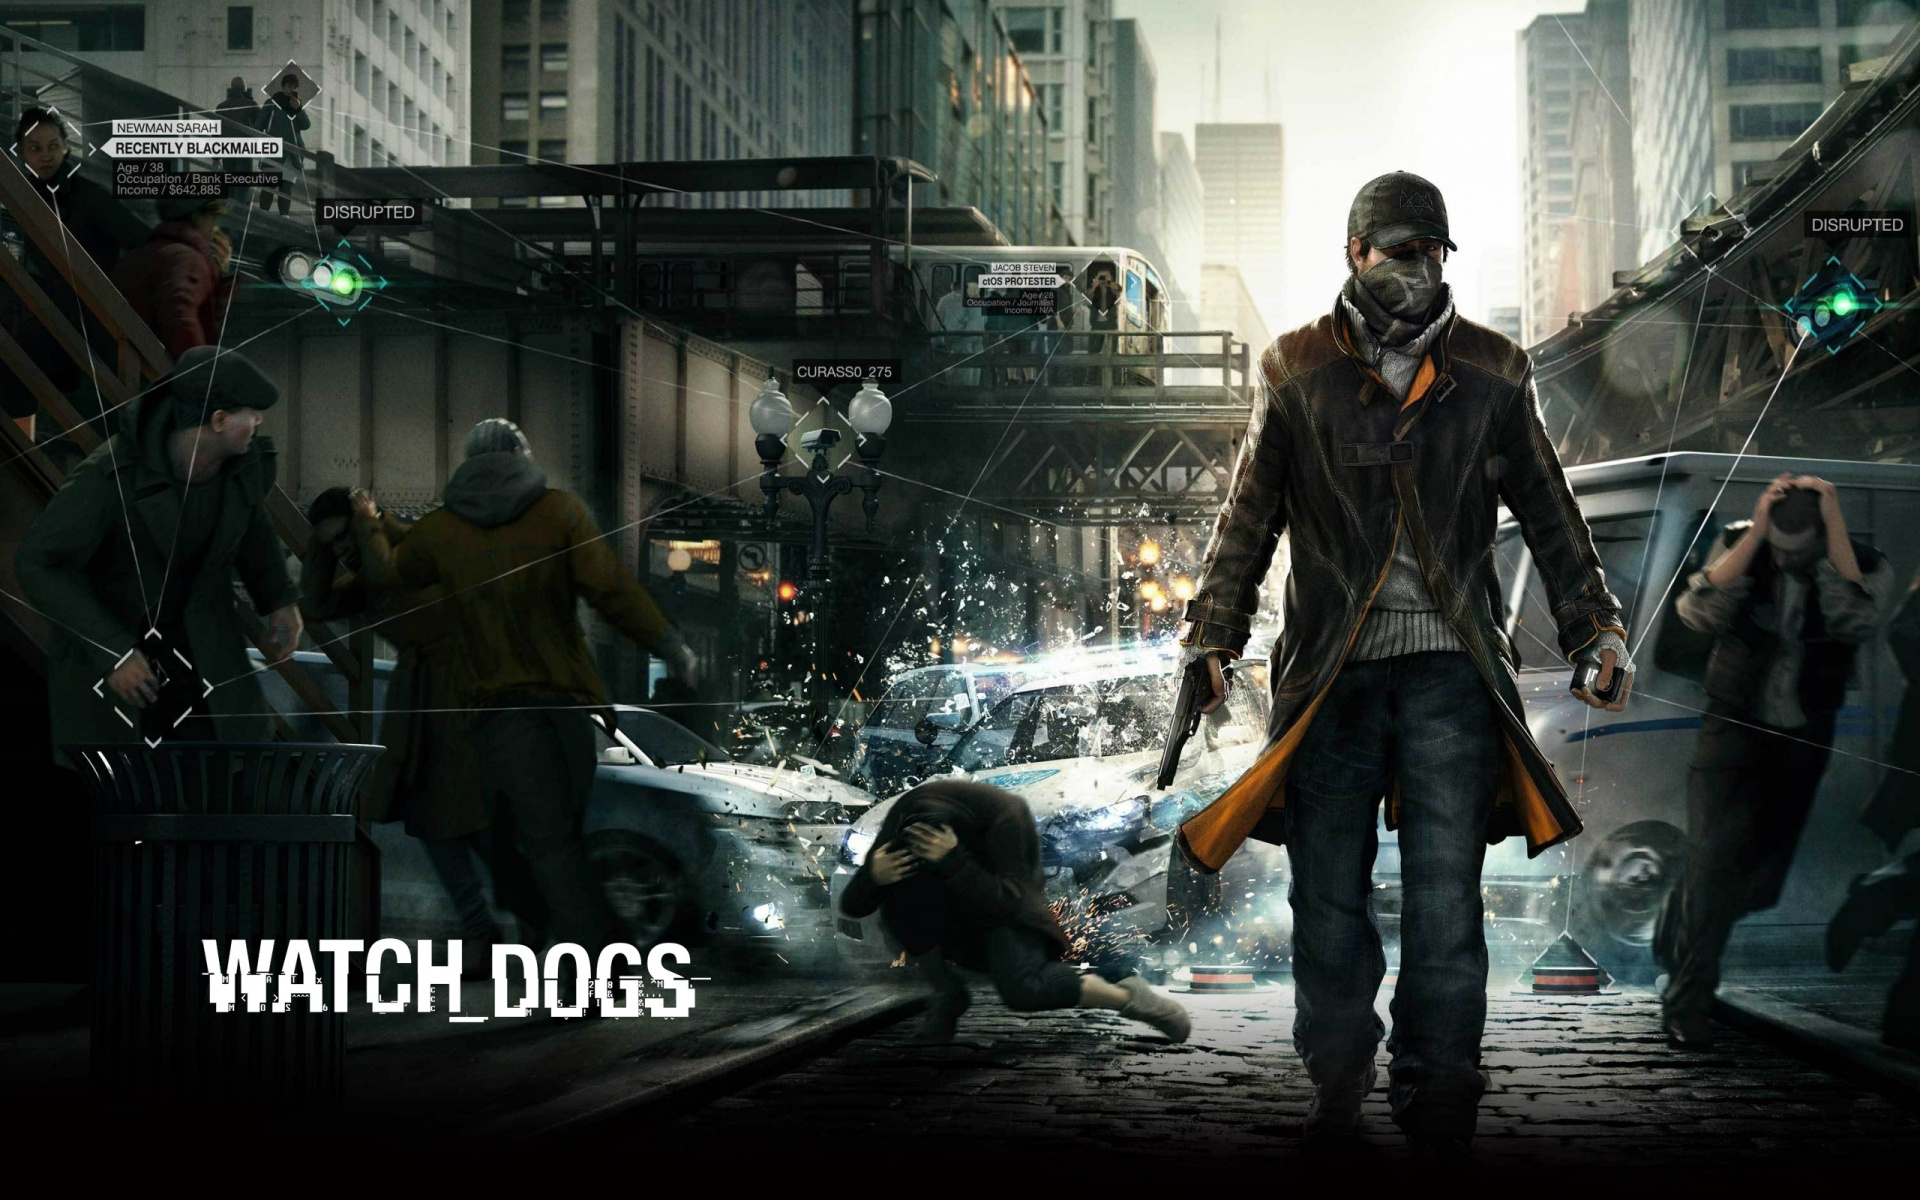 Watch Dogs Hacking Wallpaper